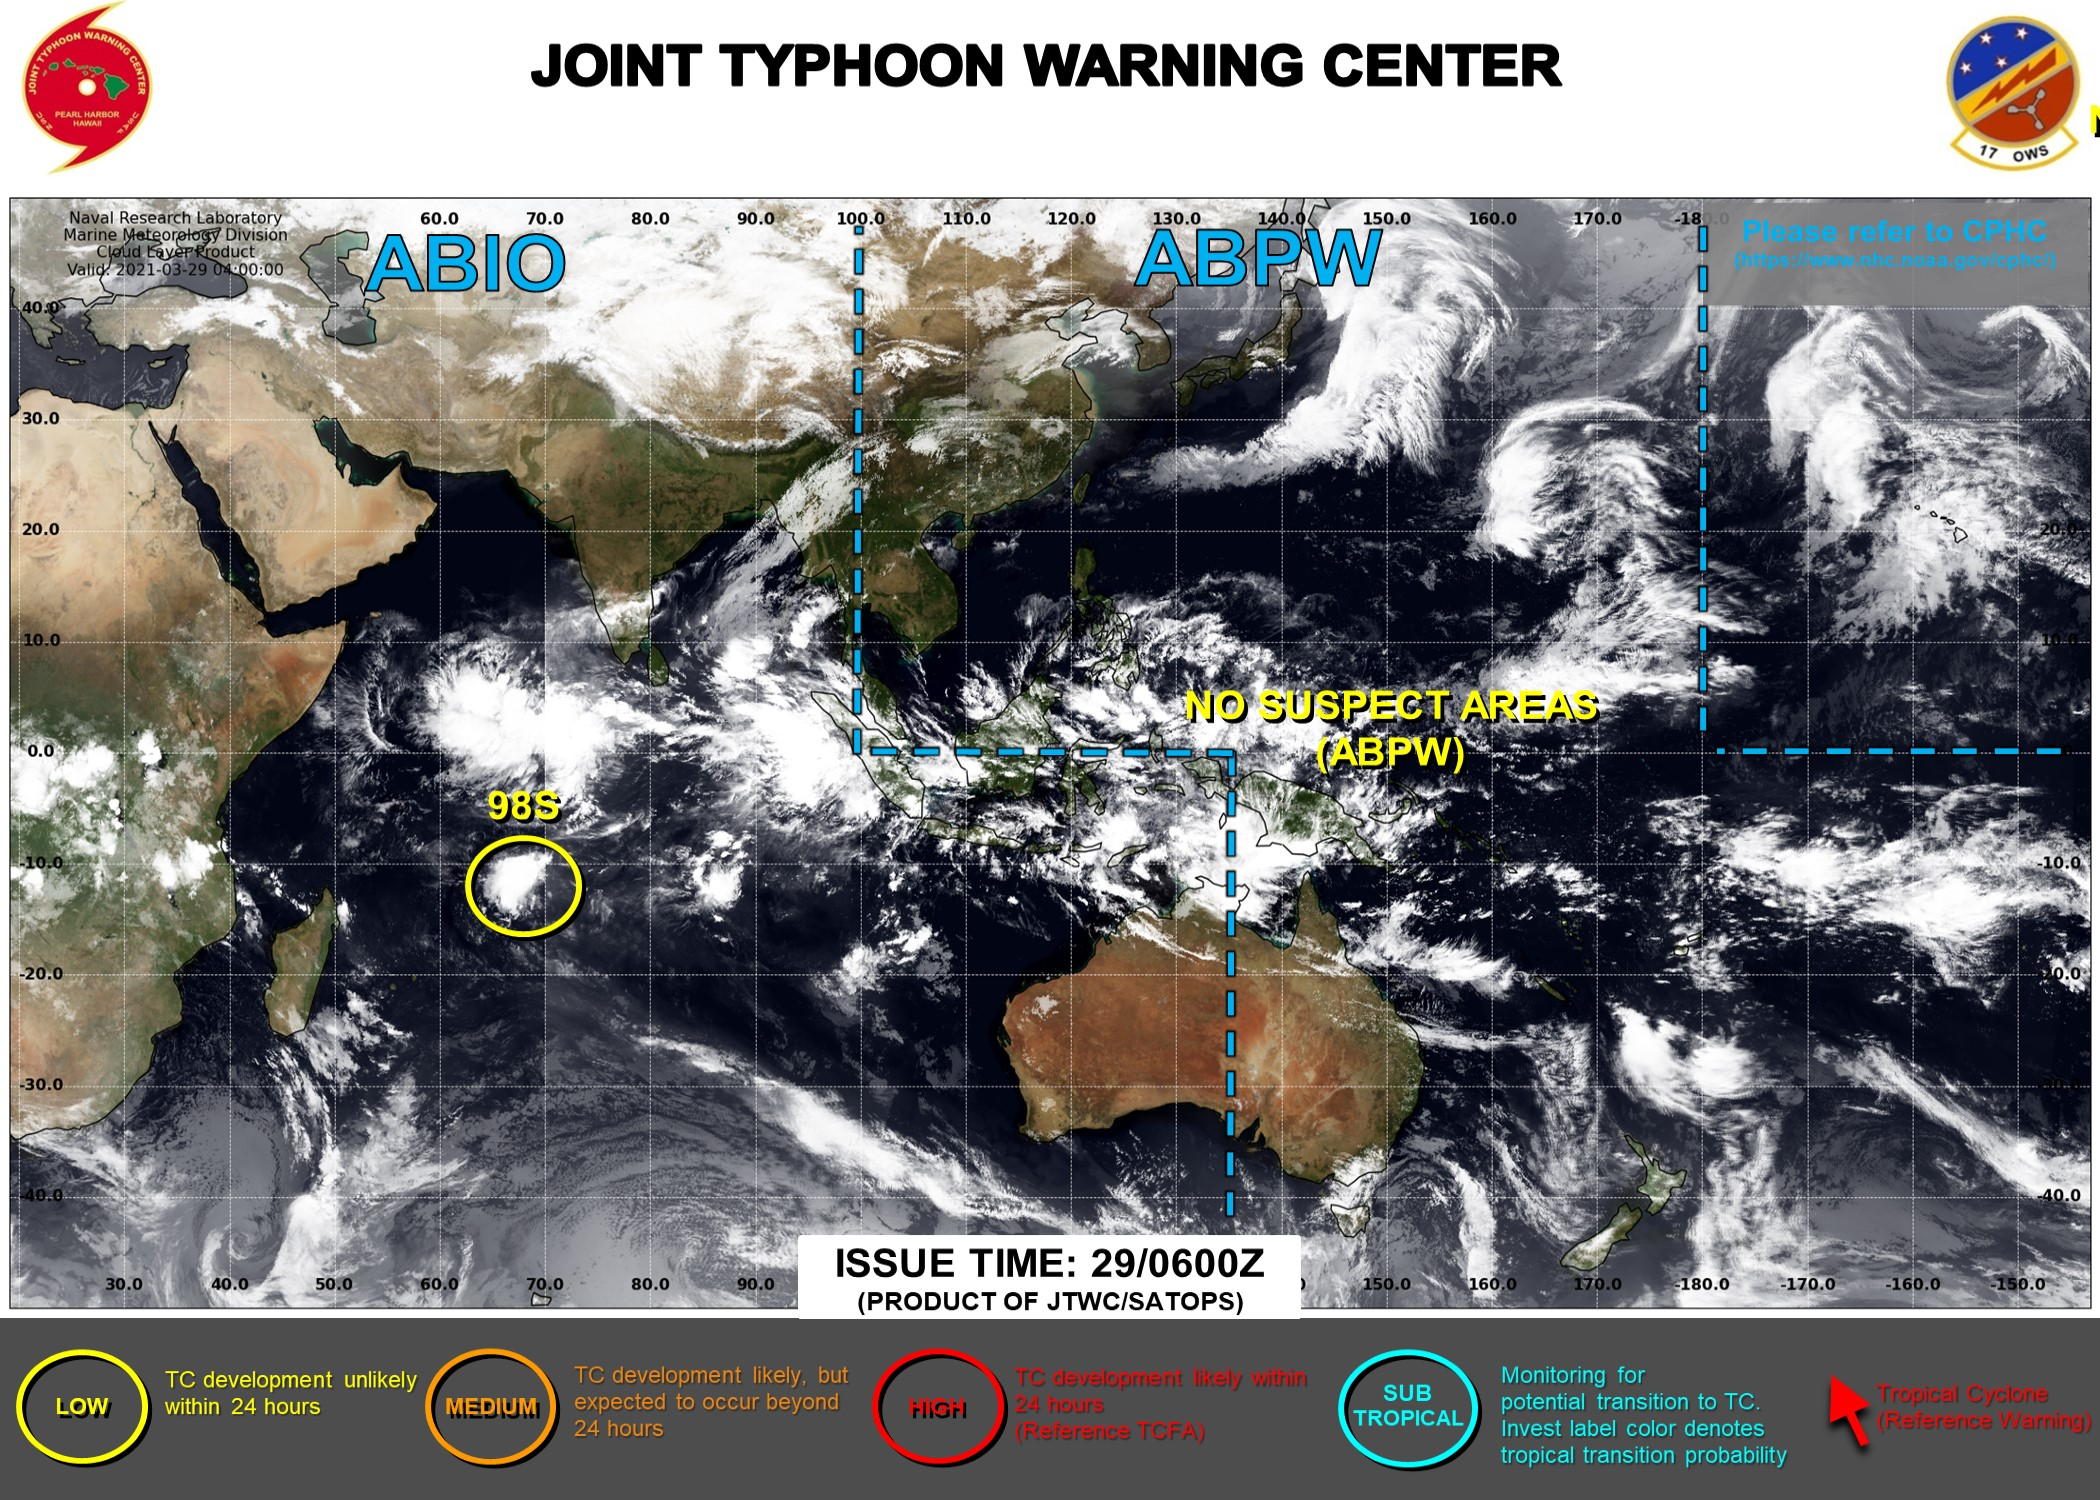 29/06UTC. JTWC IS STILL ISSUING 3HOURLY SATELLITE BULLETINS ON 98S.